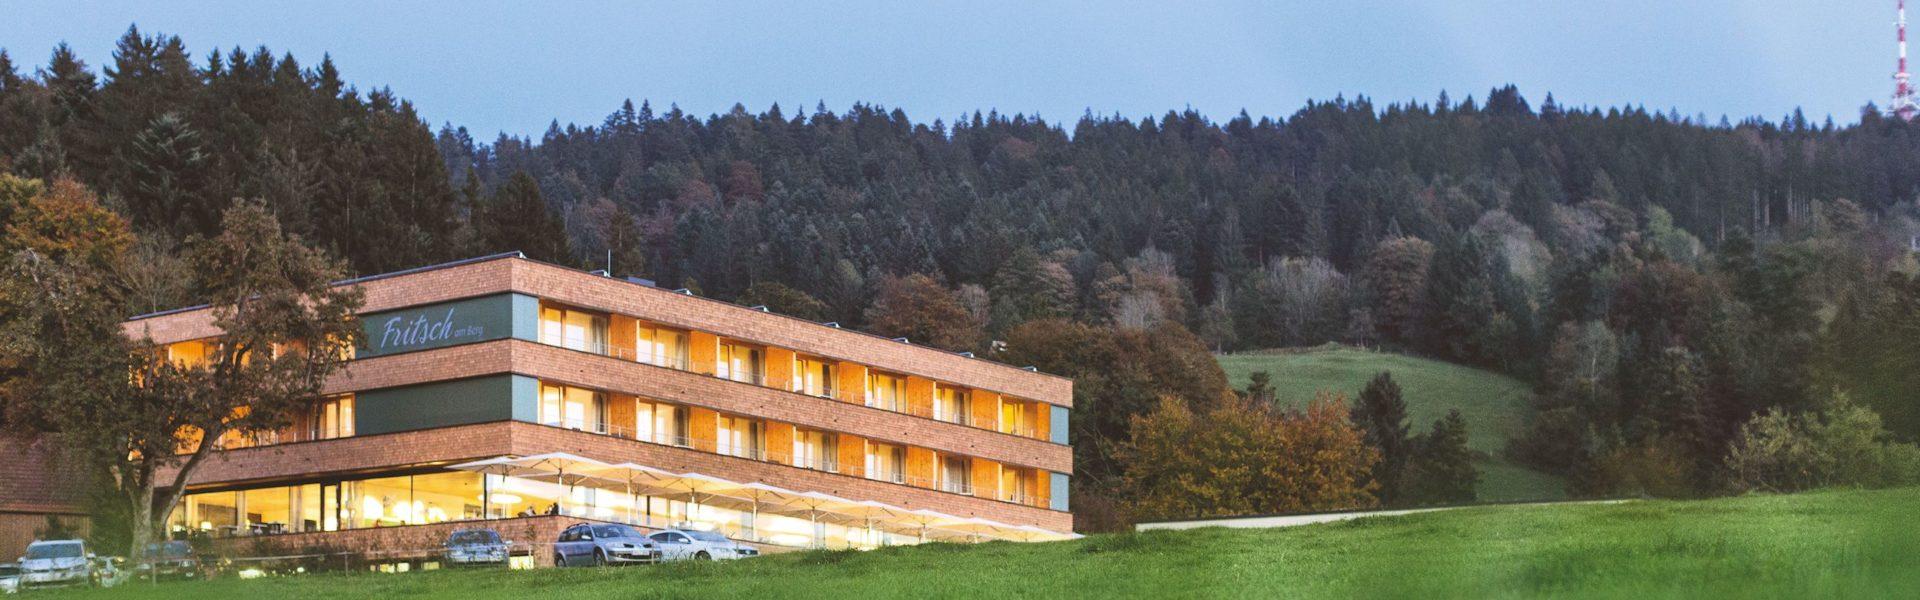 Wellnesshotel Fritsch am Berg Mental Spa, Lochau © Hotel Fritsch am Berg